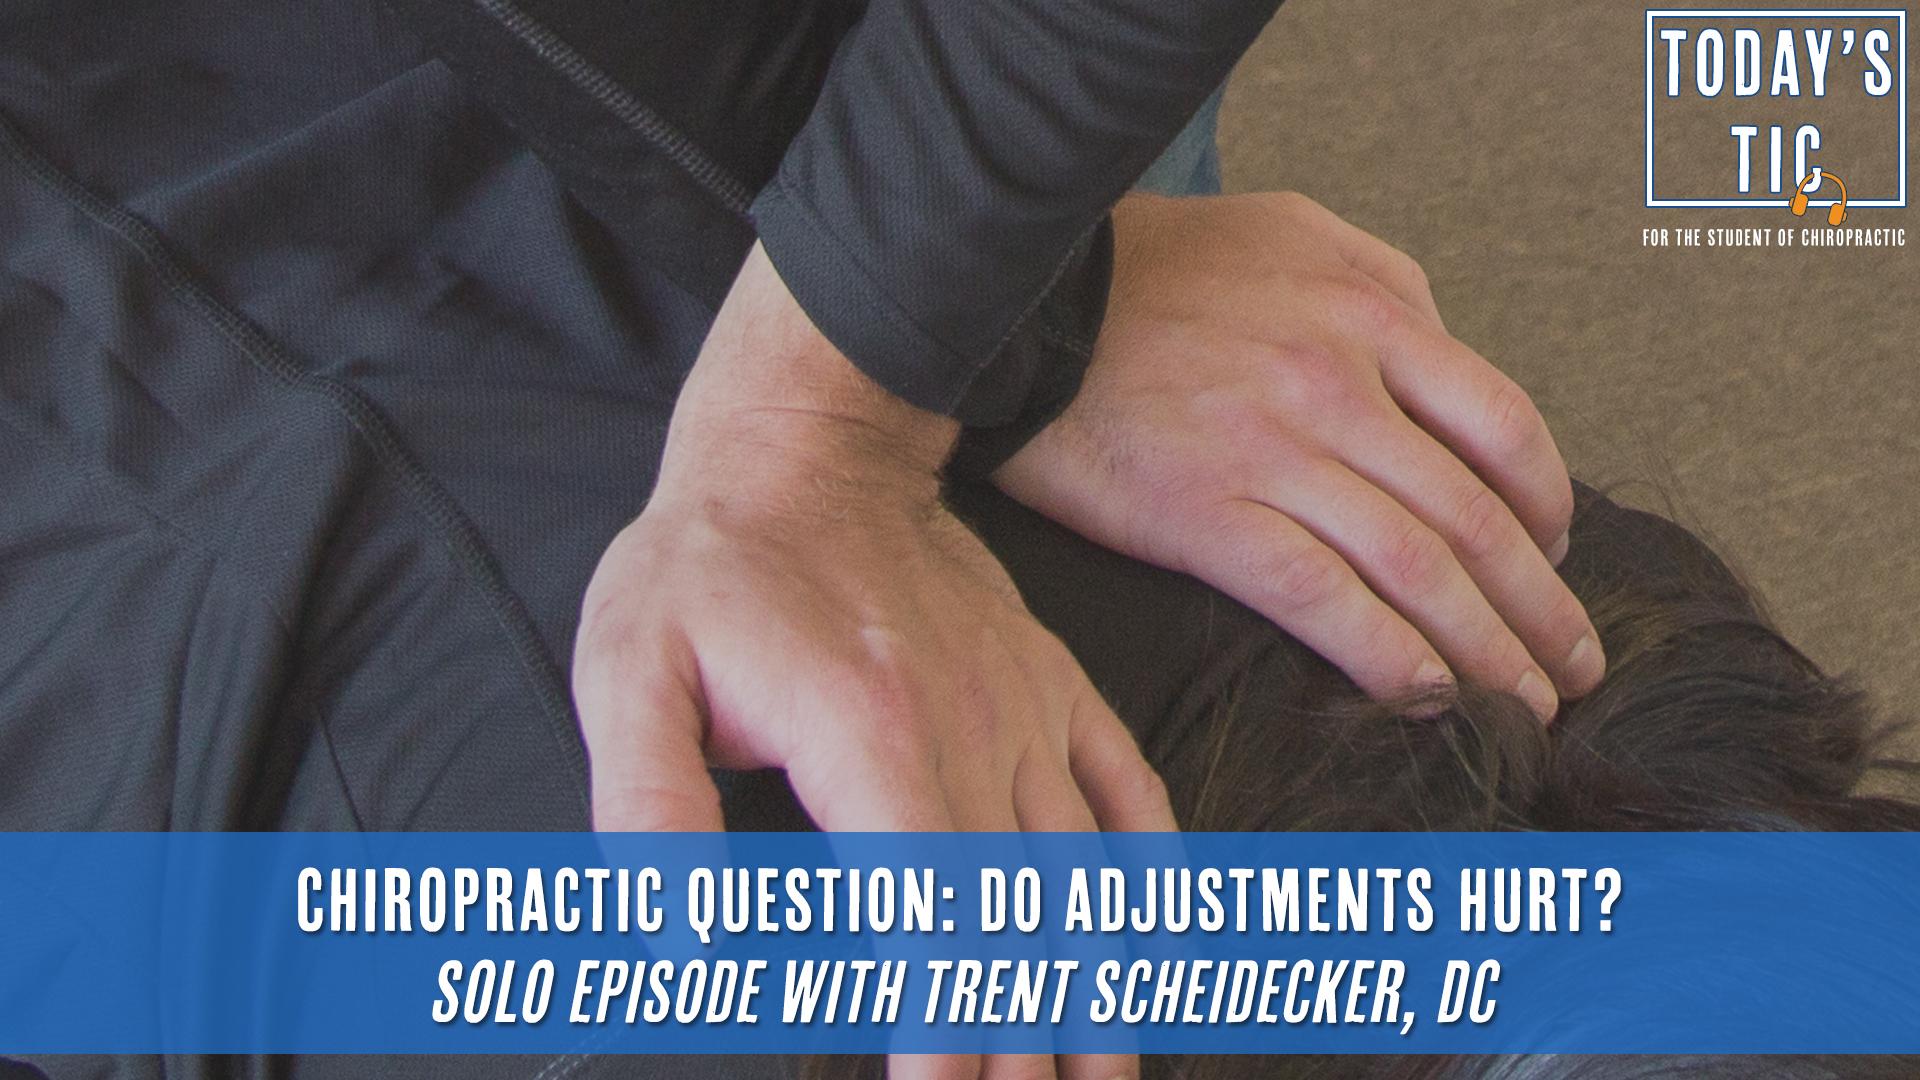 Chiropractic Question: Do Adjustments Hurt?